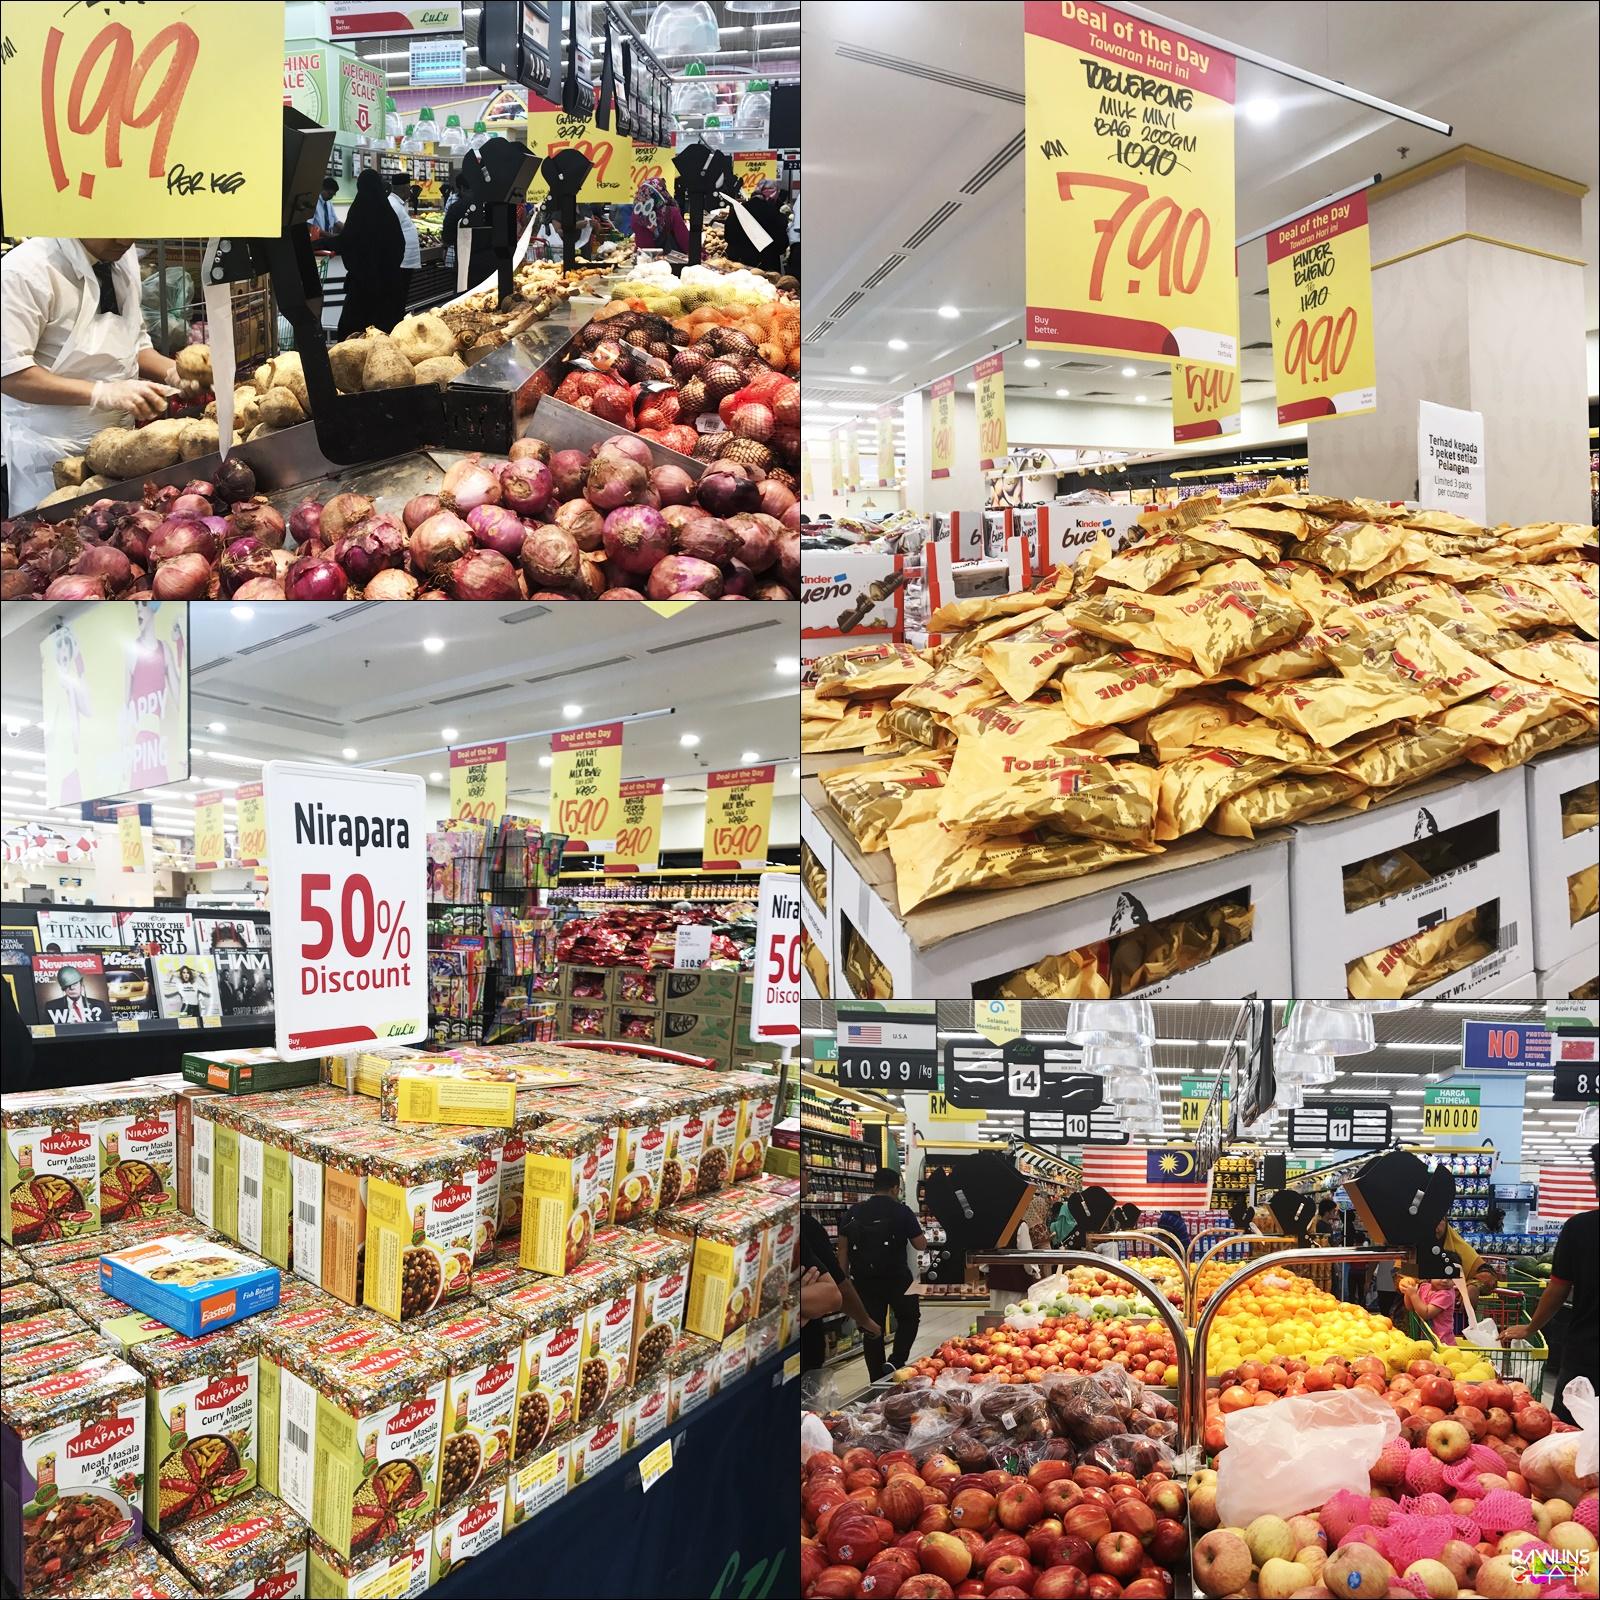 Lulu Hypermarker Caps Square, Lulu Hypermarket Kuala Lumpur, pasar raya murah, Malaysia Book of Record, The Longest Fresh Fruit Cake, Hari Malaysia, Rawlins GLAM,